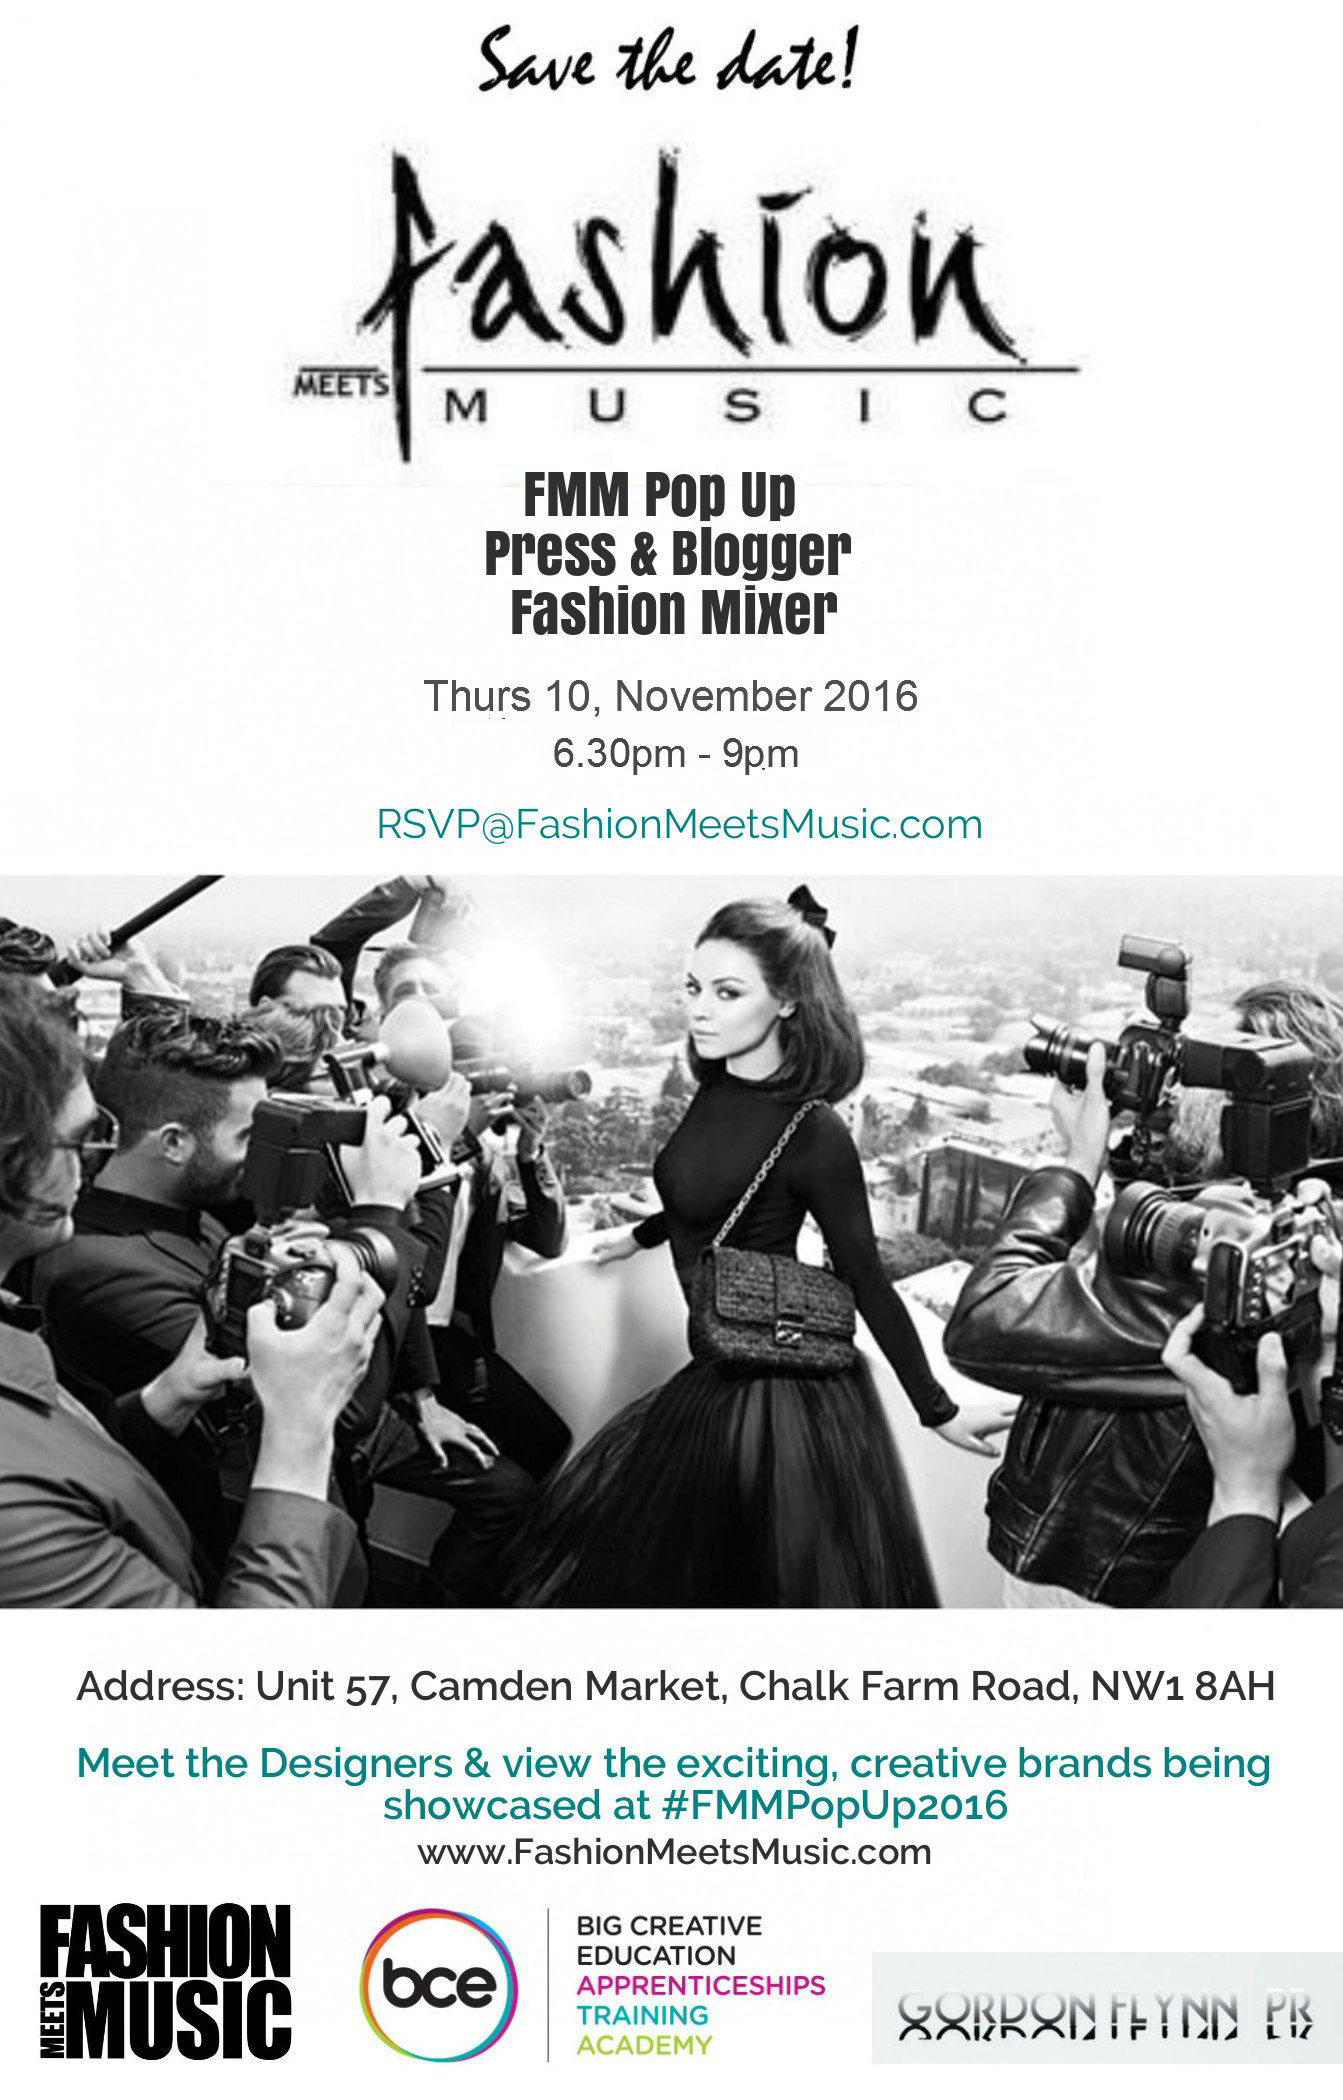 Fashion Meets Music Press and Blogger Fashion Mixer